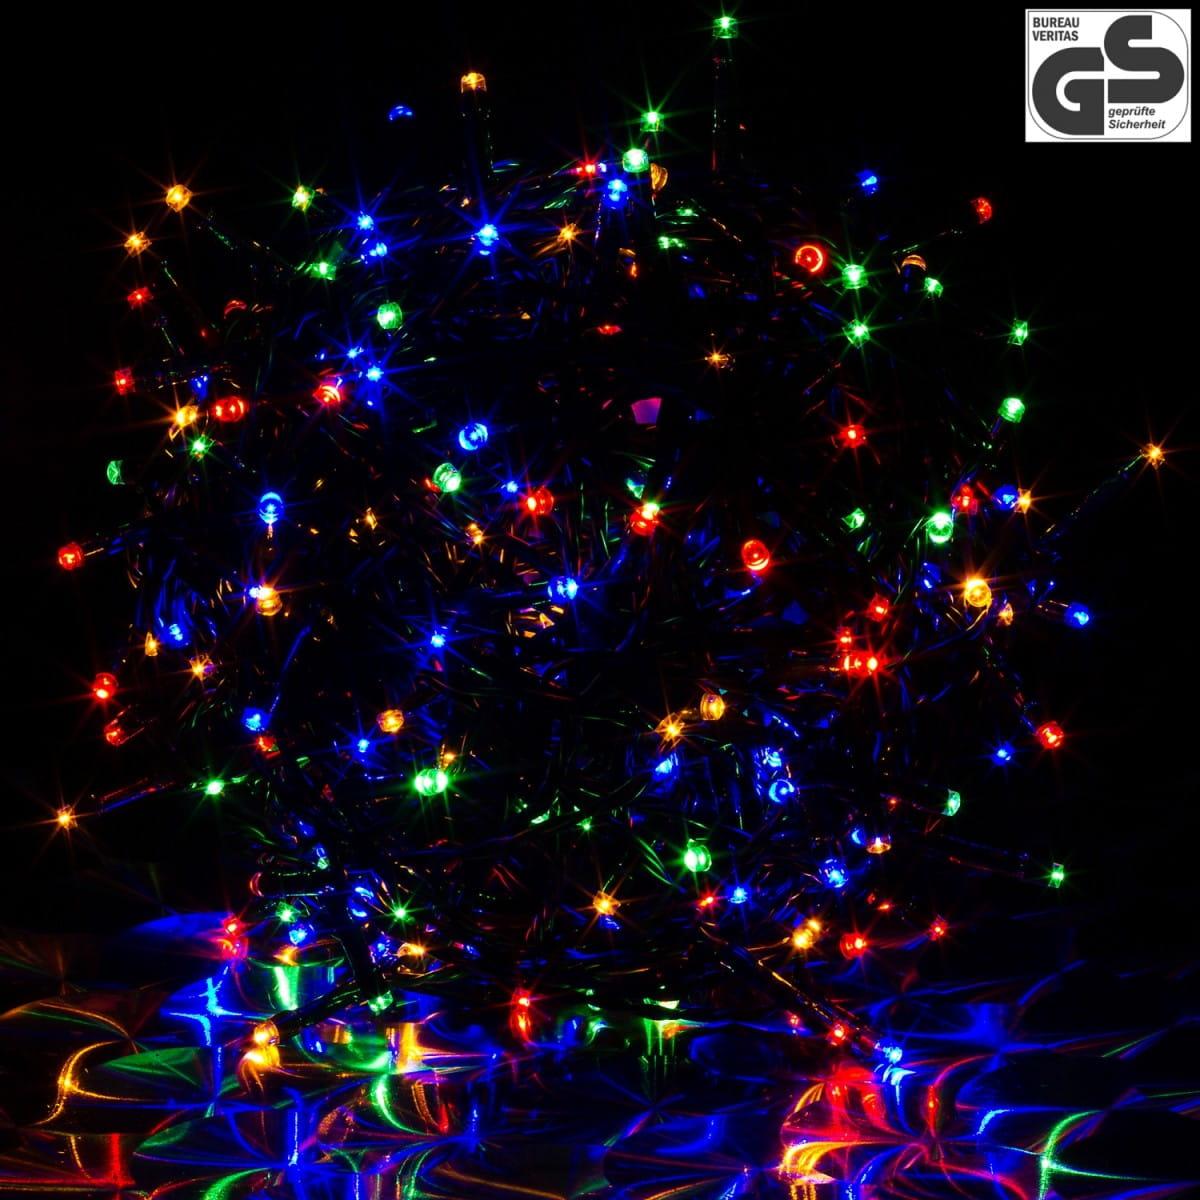 Lampki 200 Led Kolorowe Zielony Kabel 20 M Na łańcuchu Joylight